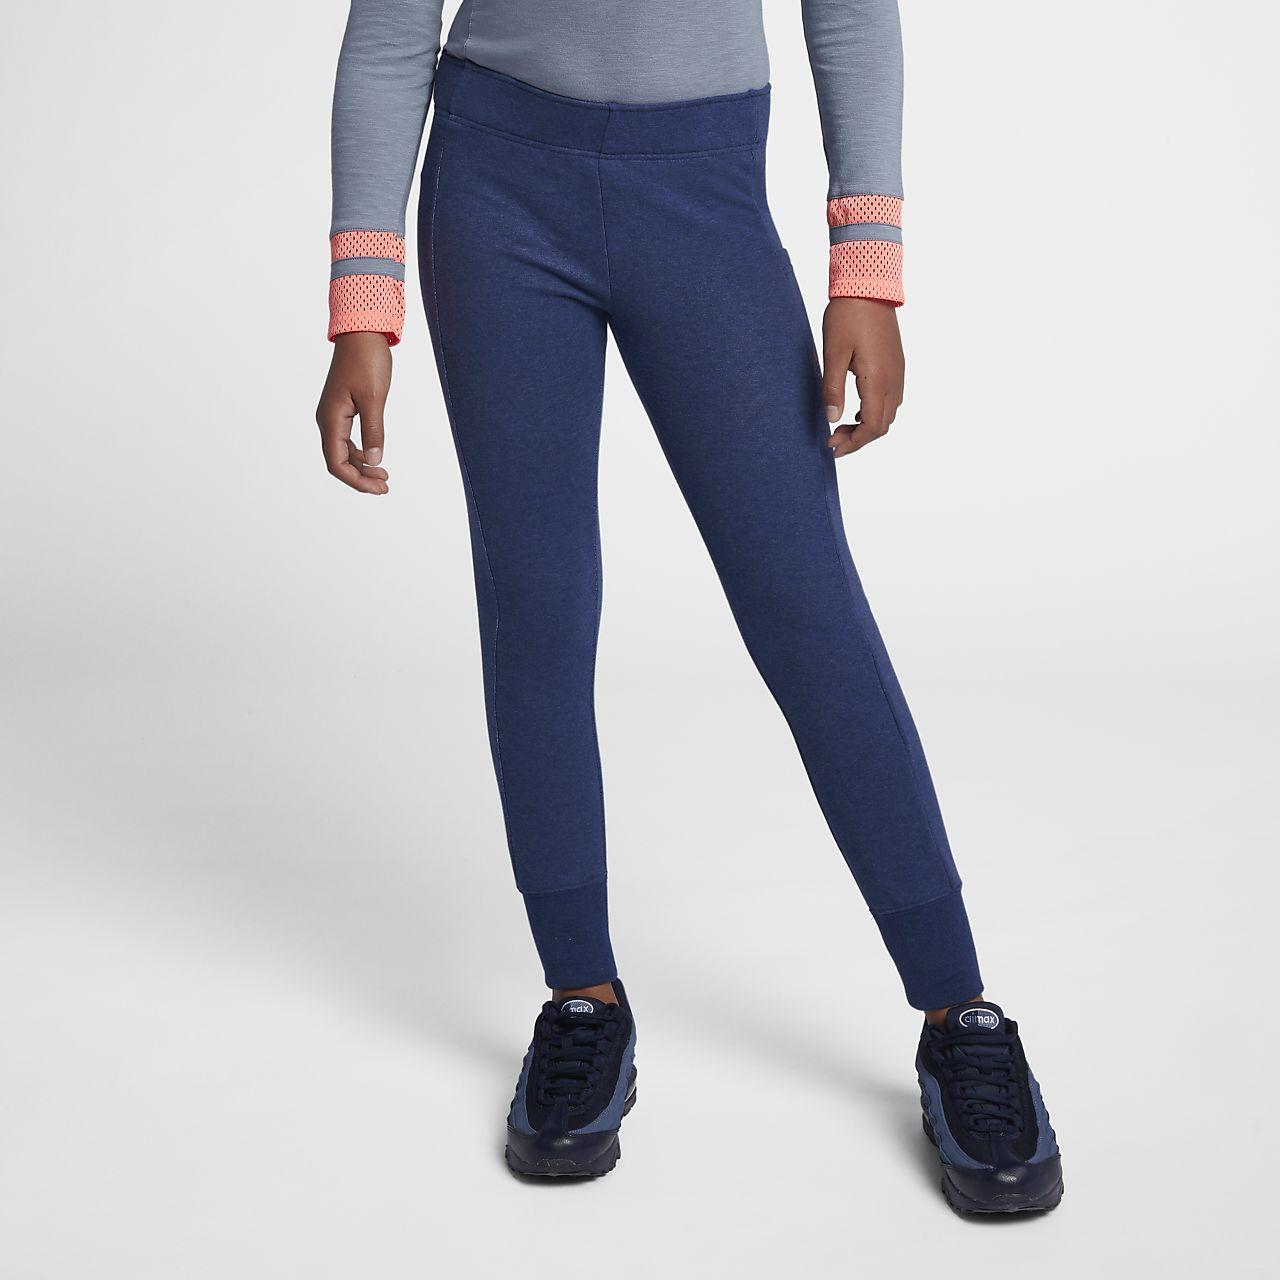 Nike Sportswear My Nike 大童(女孩)长裤